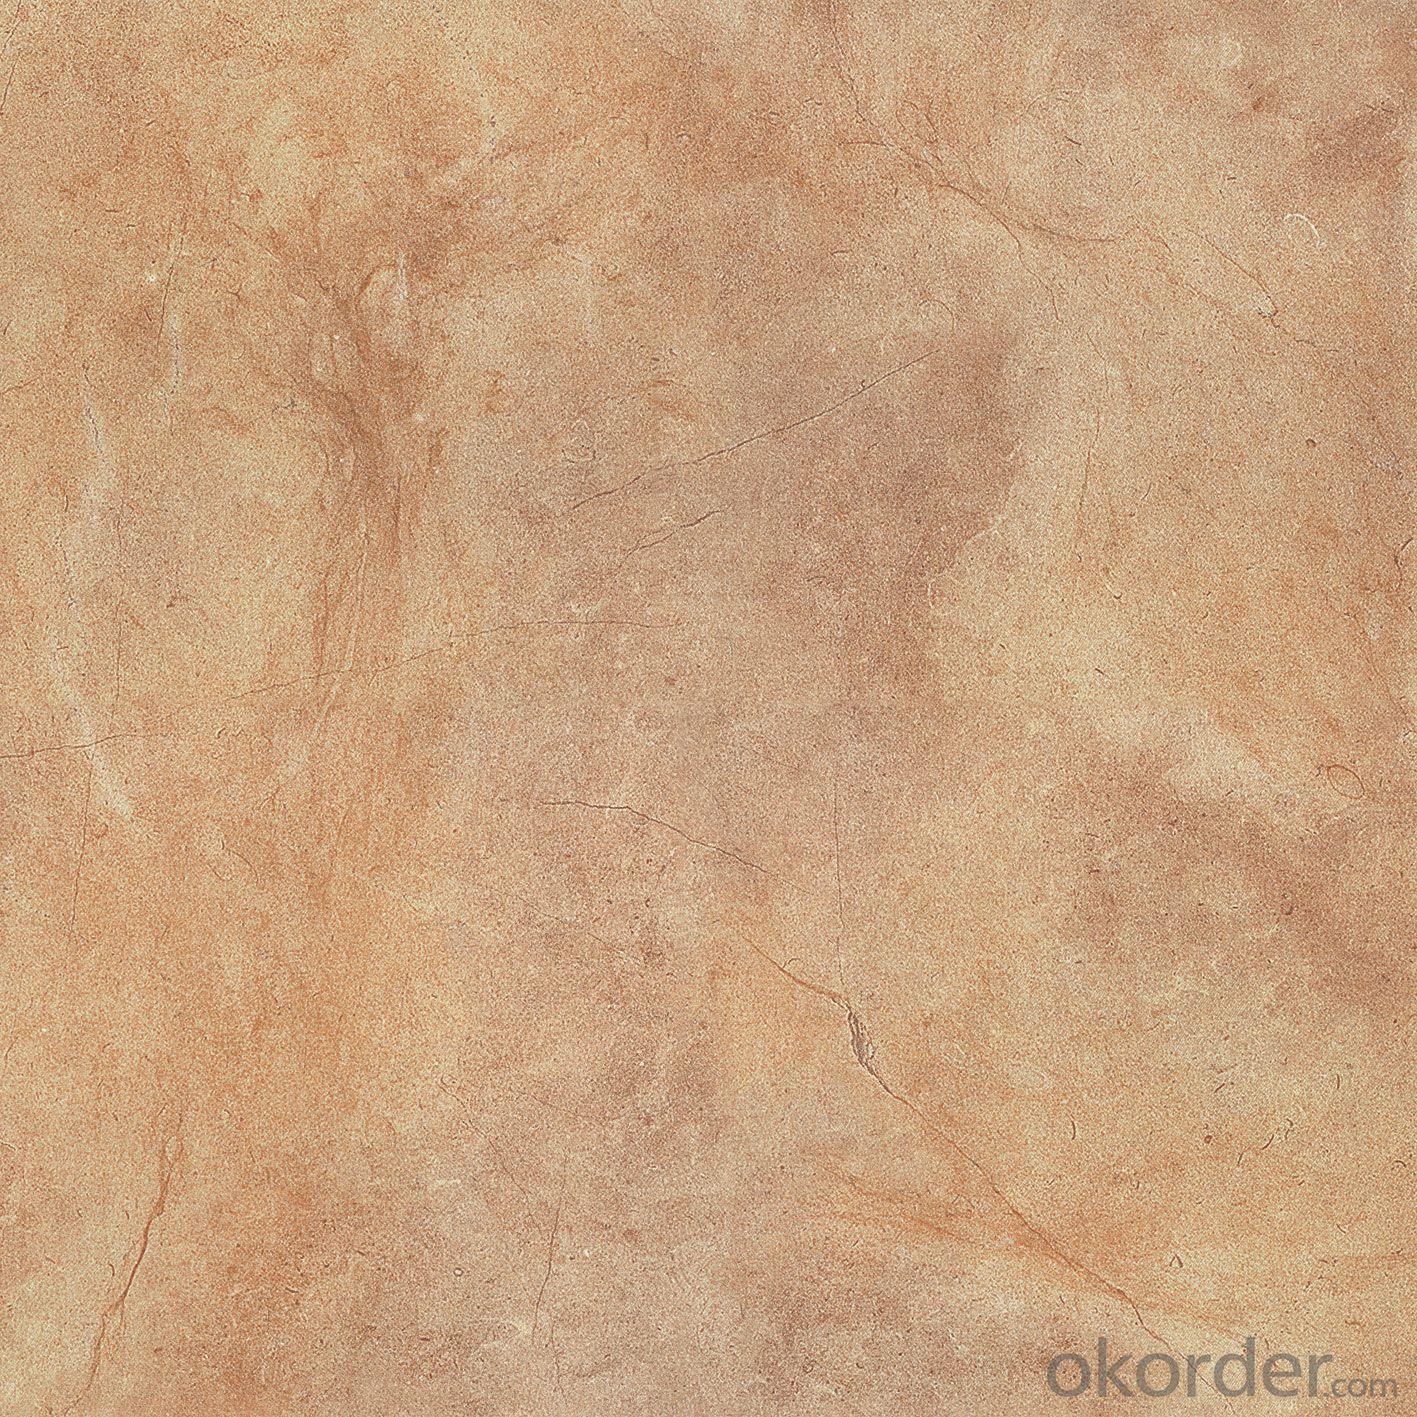 Glazed Porcelain Floor Tile 600x600mm CMAX-TS6001